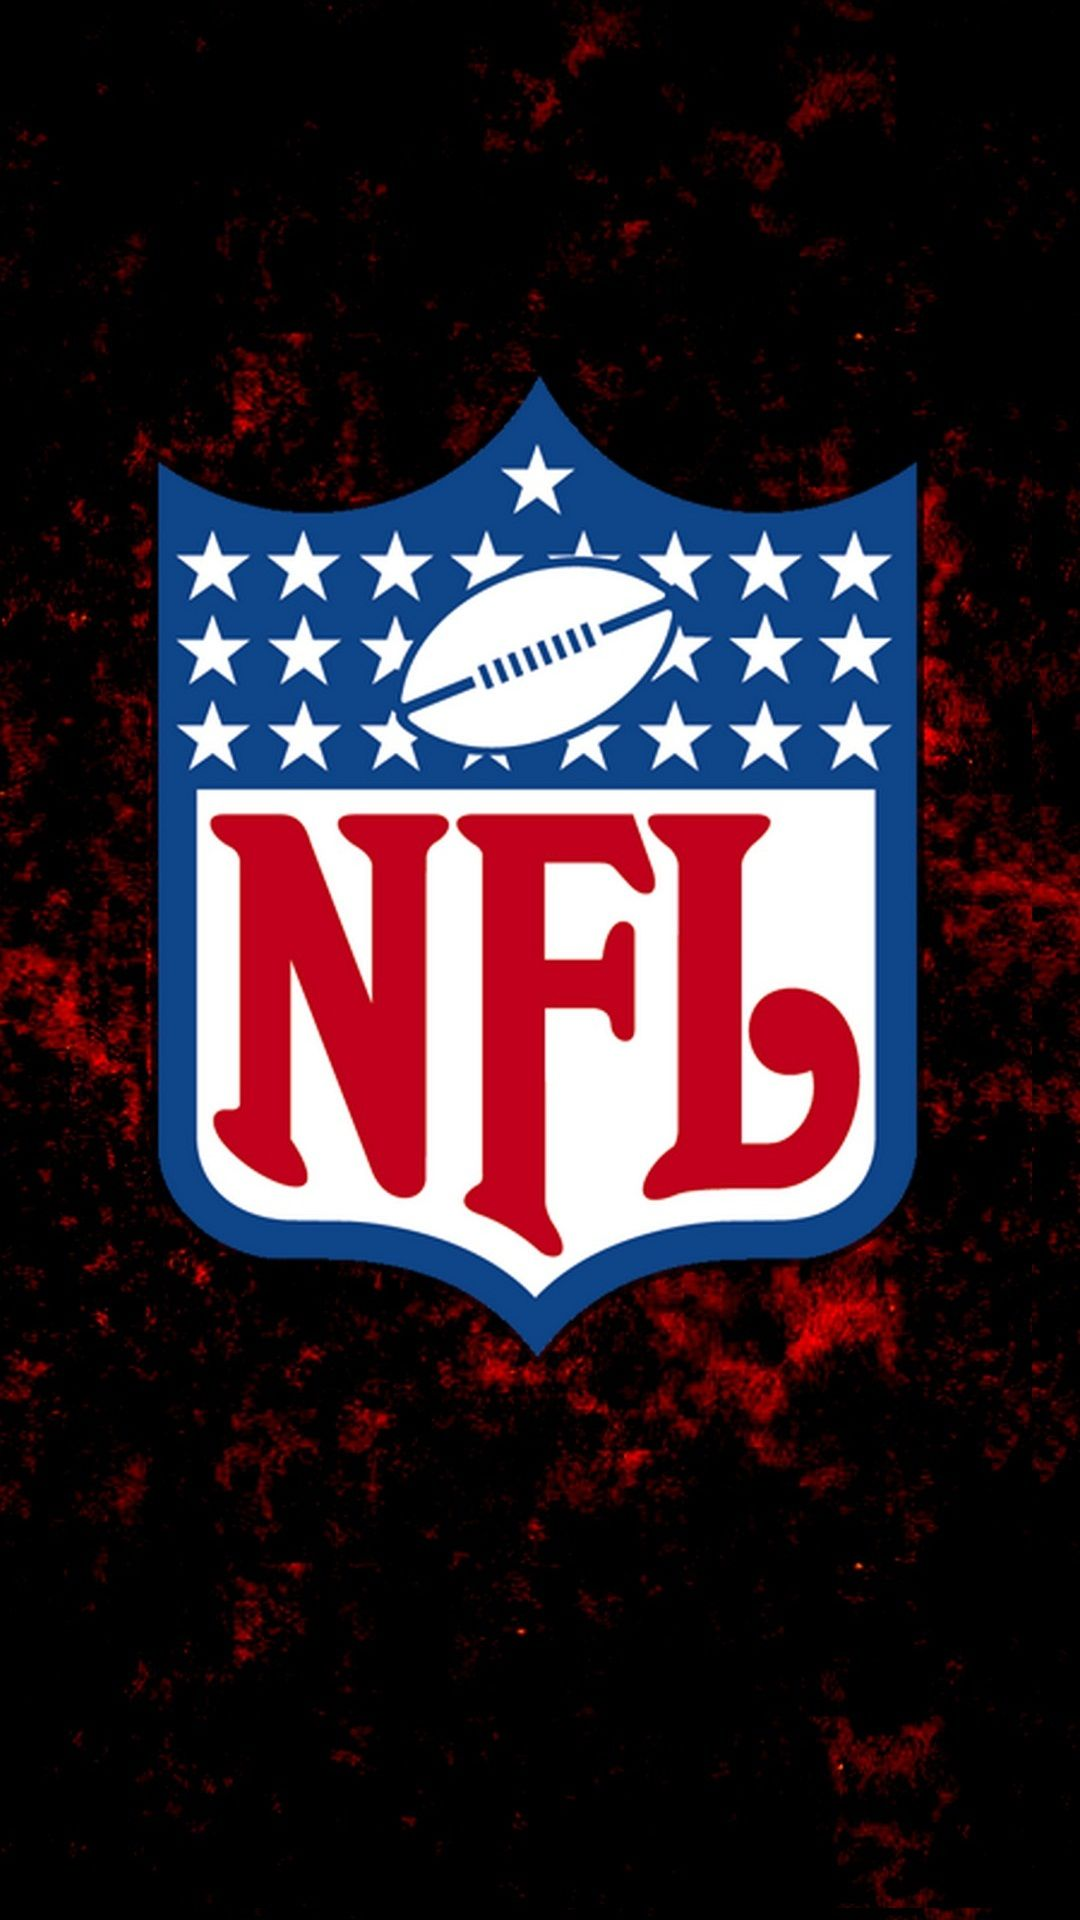 Cool Nfl Iphone X Wallpaper 2020 Nfl Football Wallpapers Nfl Logo Nfl Logo Quiz Nfl